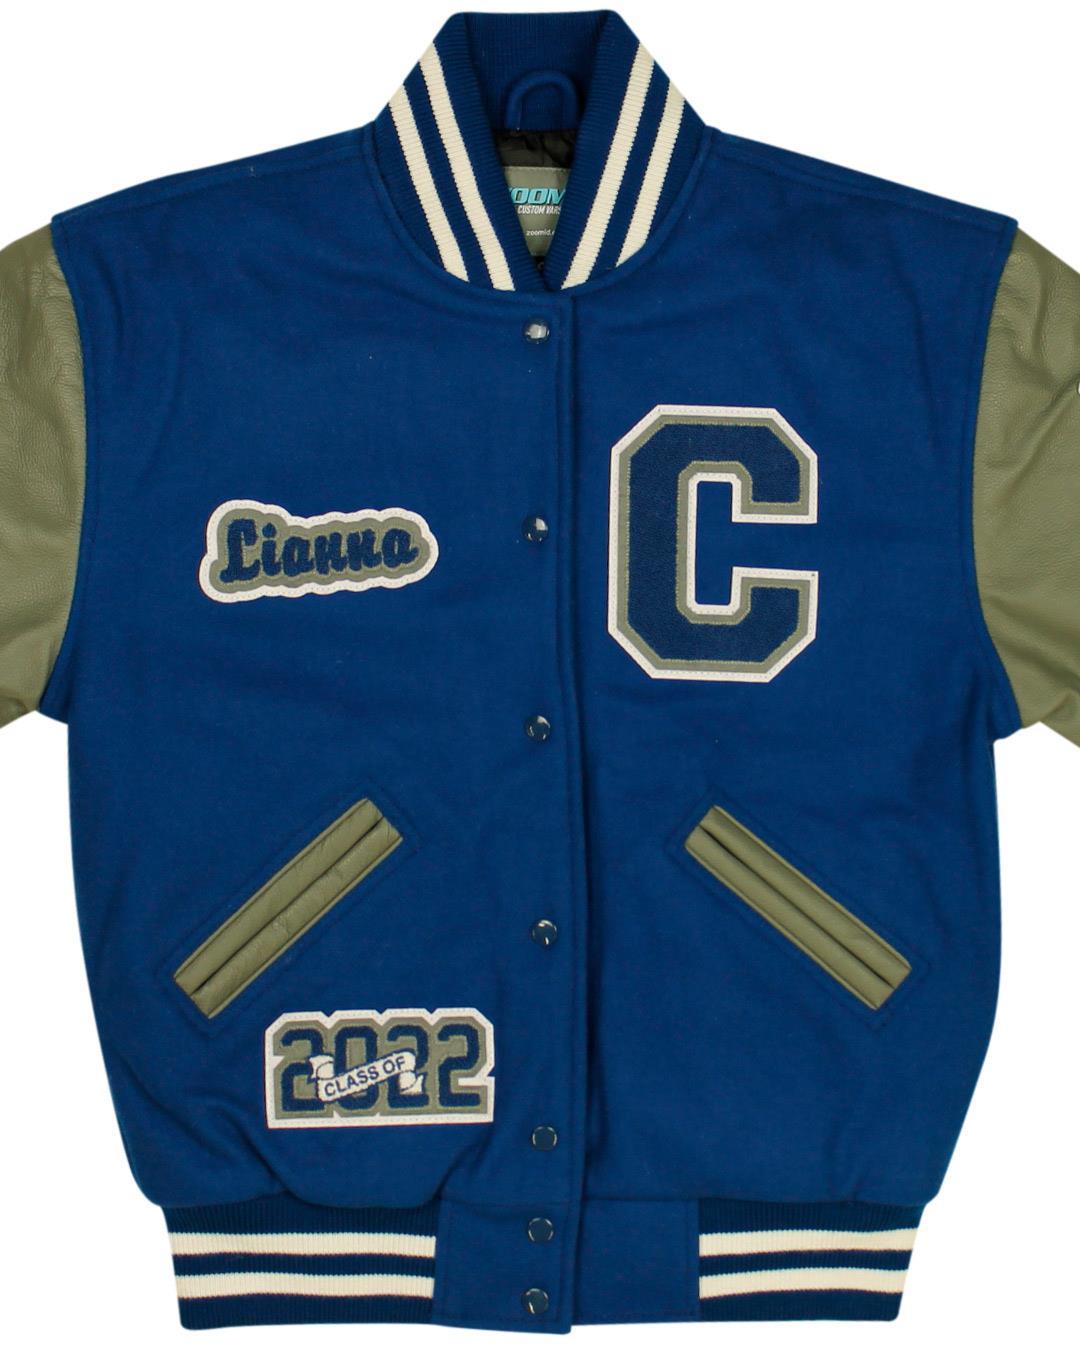 Campbell High School Letterman Jacket, Smyrna GA - Front